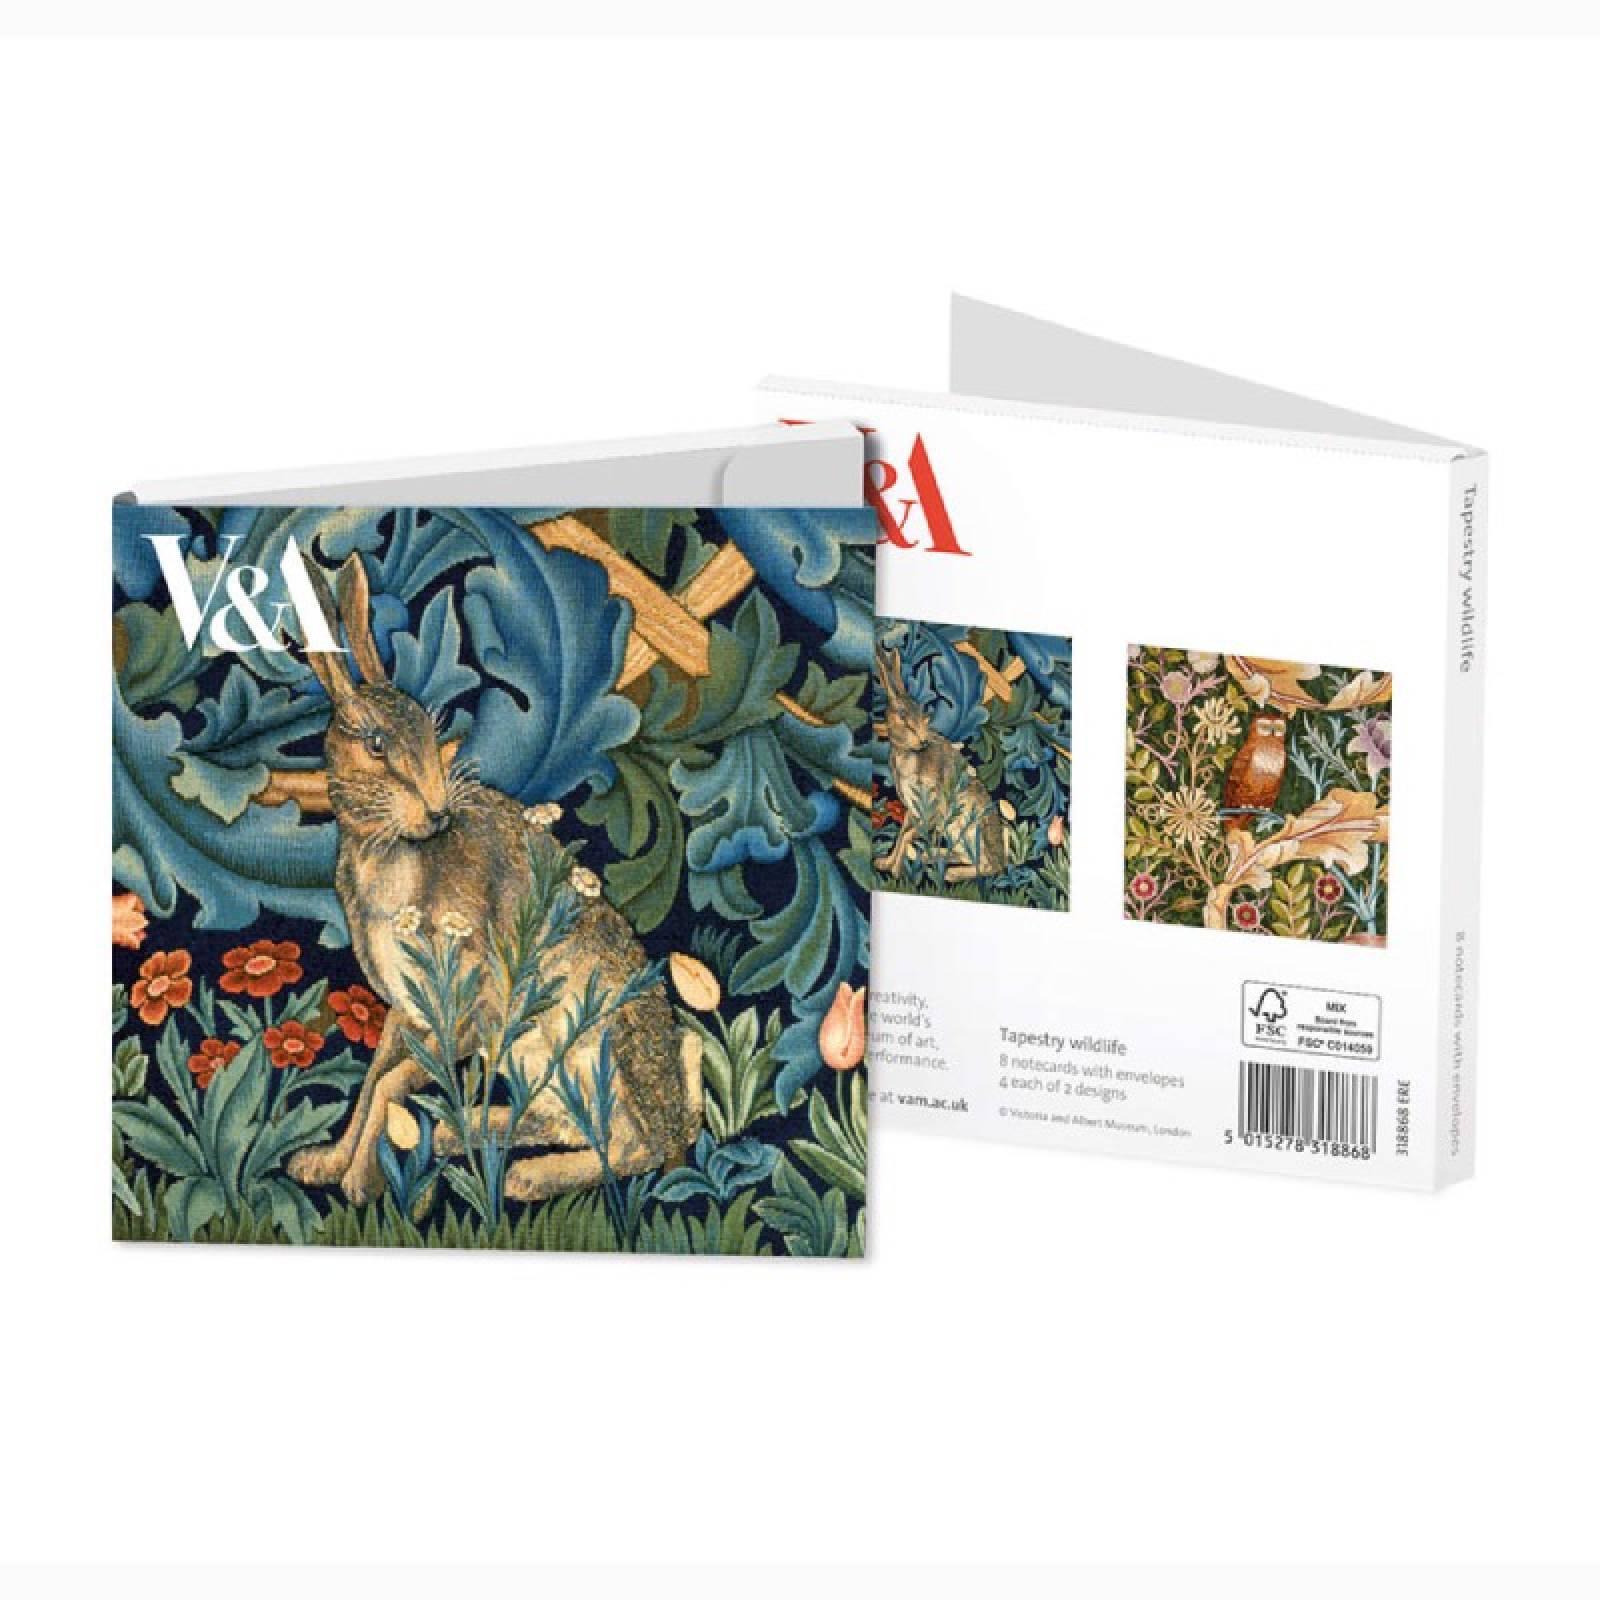 Tapestry Wildlife - Set Of 8 Notecards & Envelopes